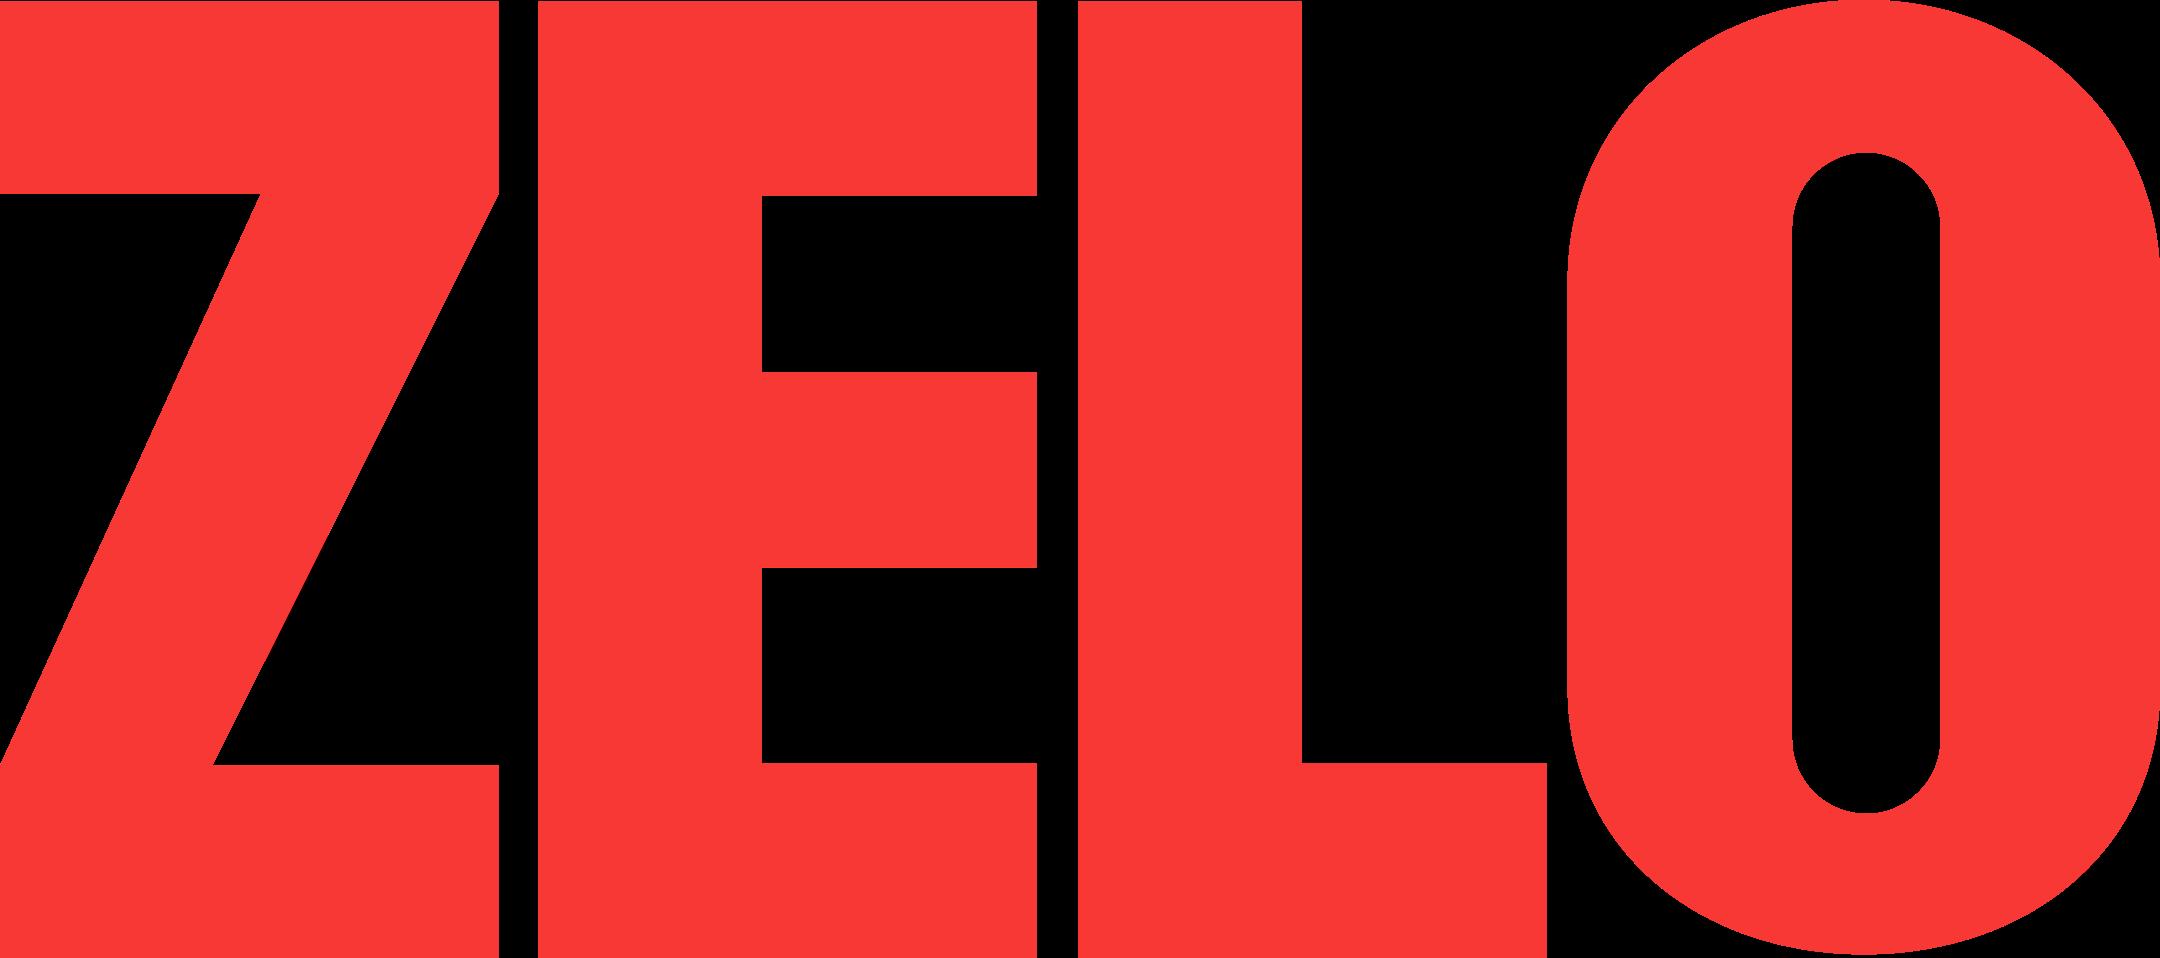 zelo logo 1 - Zelo Logo